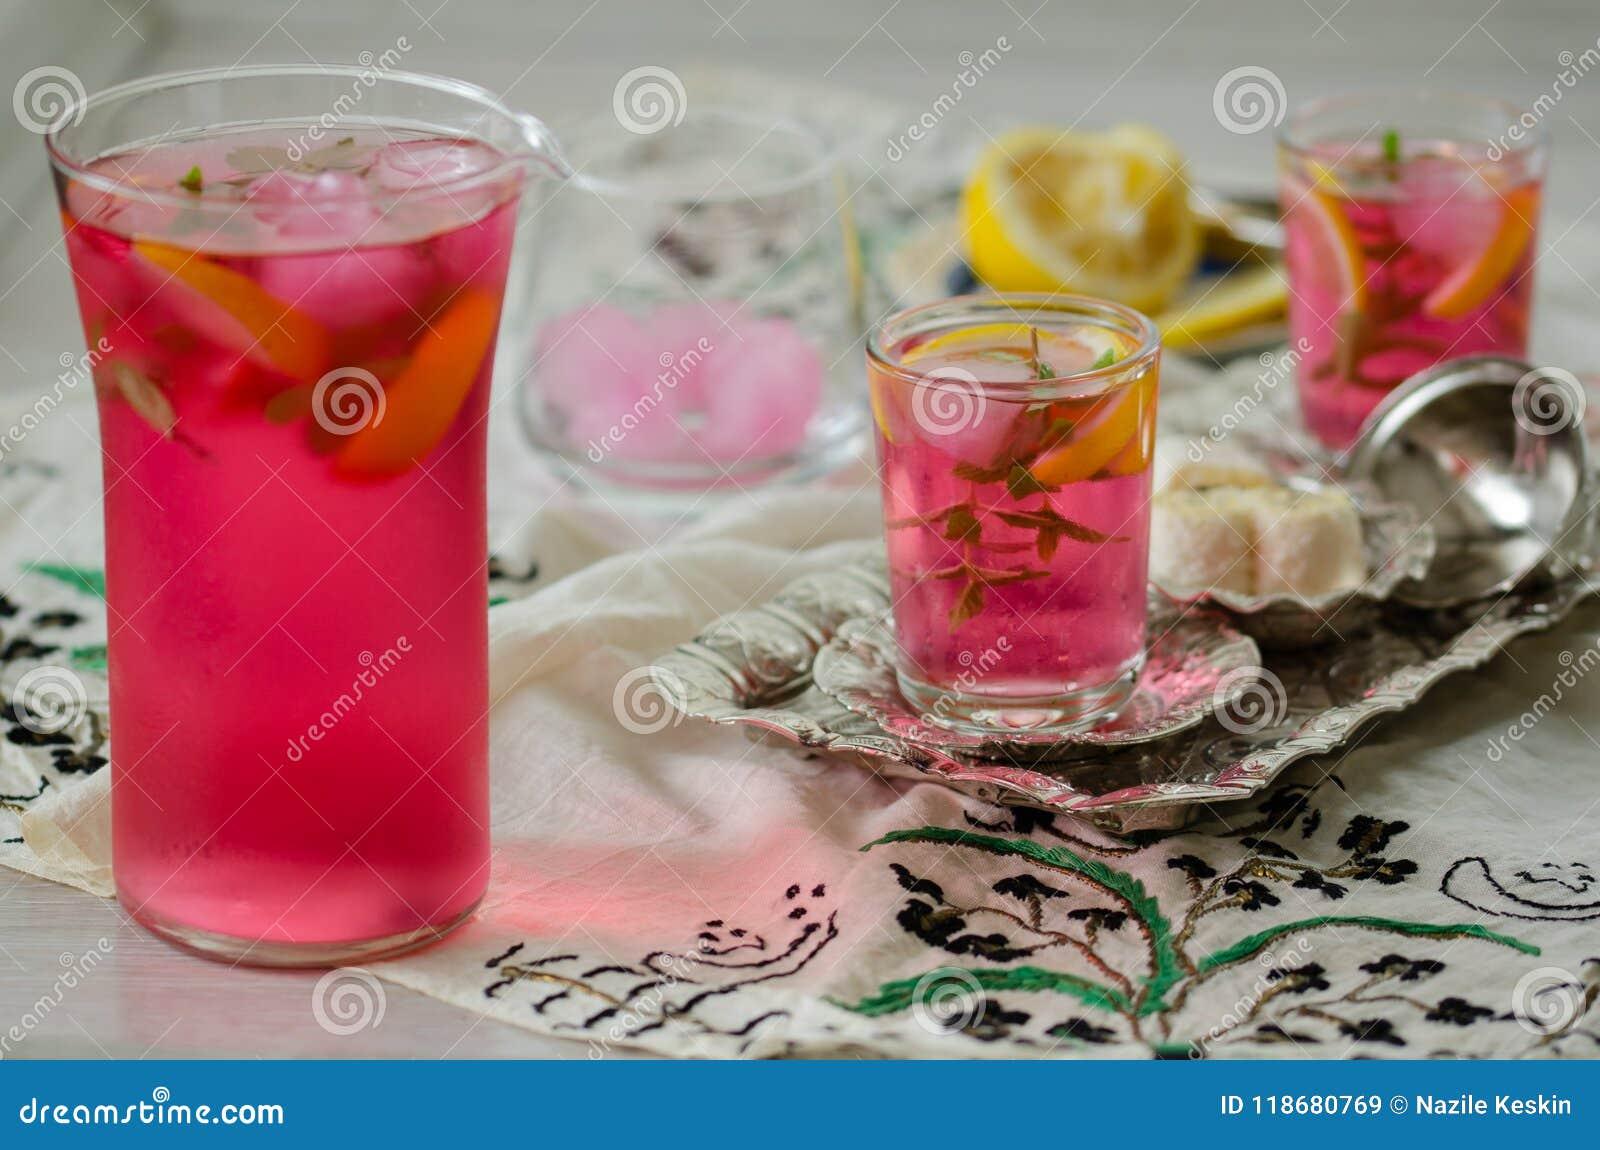 Shcherbet is a sweetness or a drink